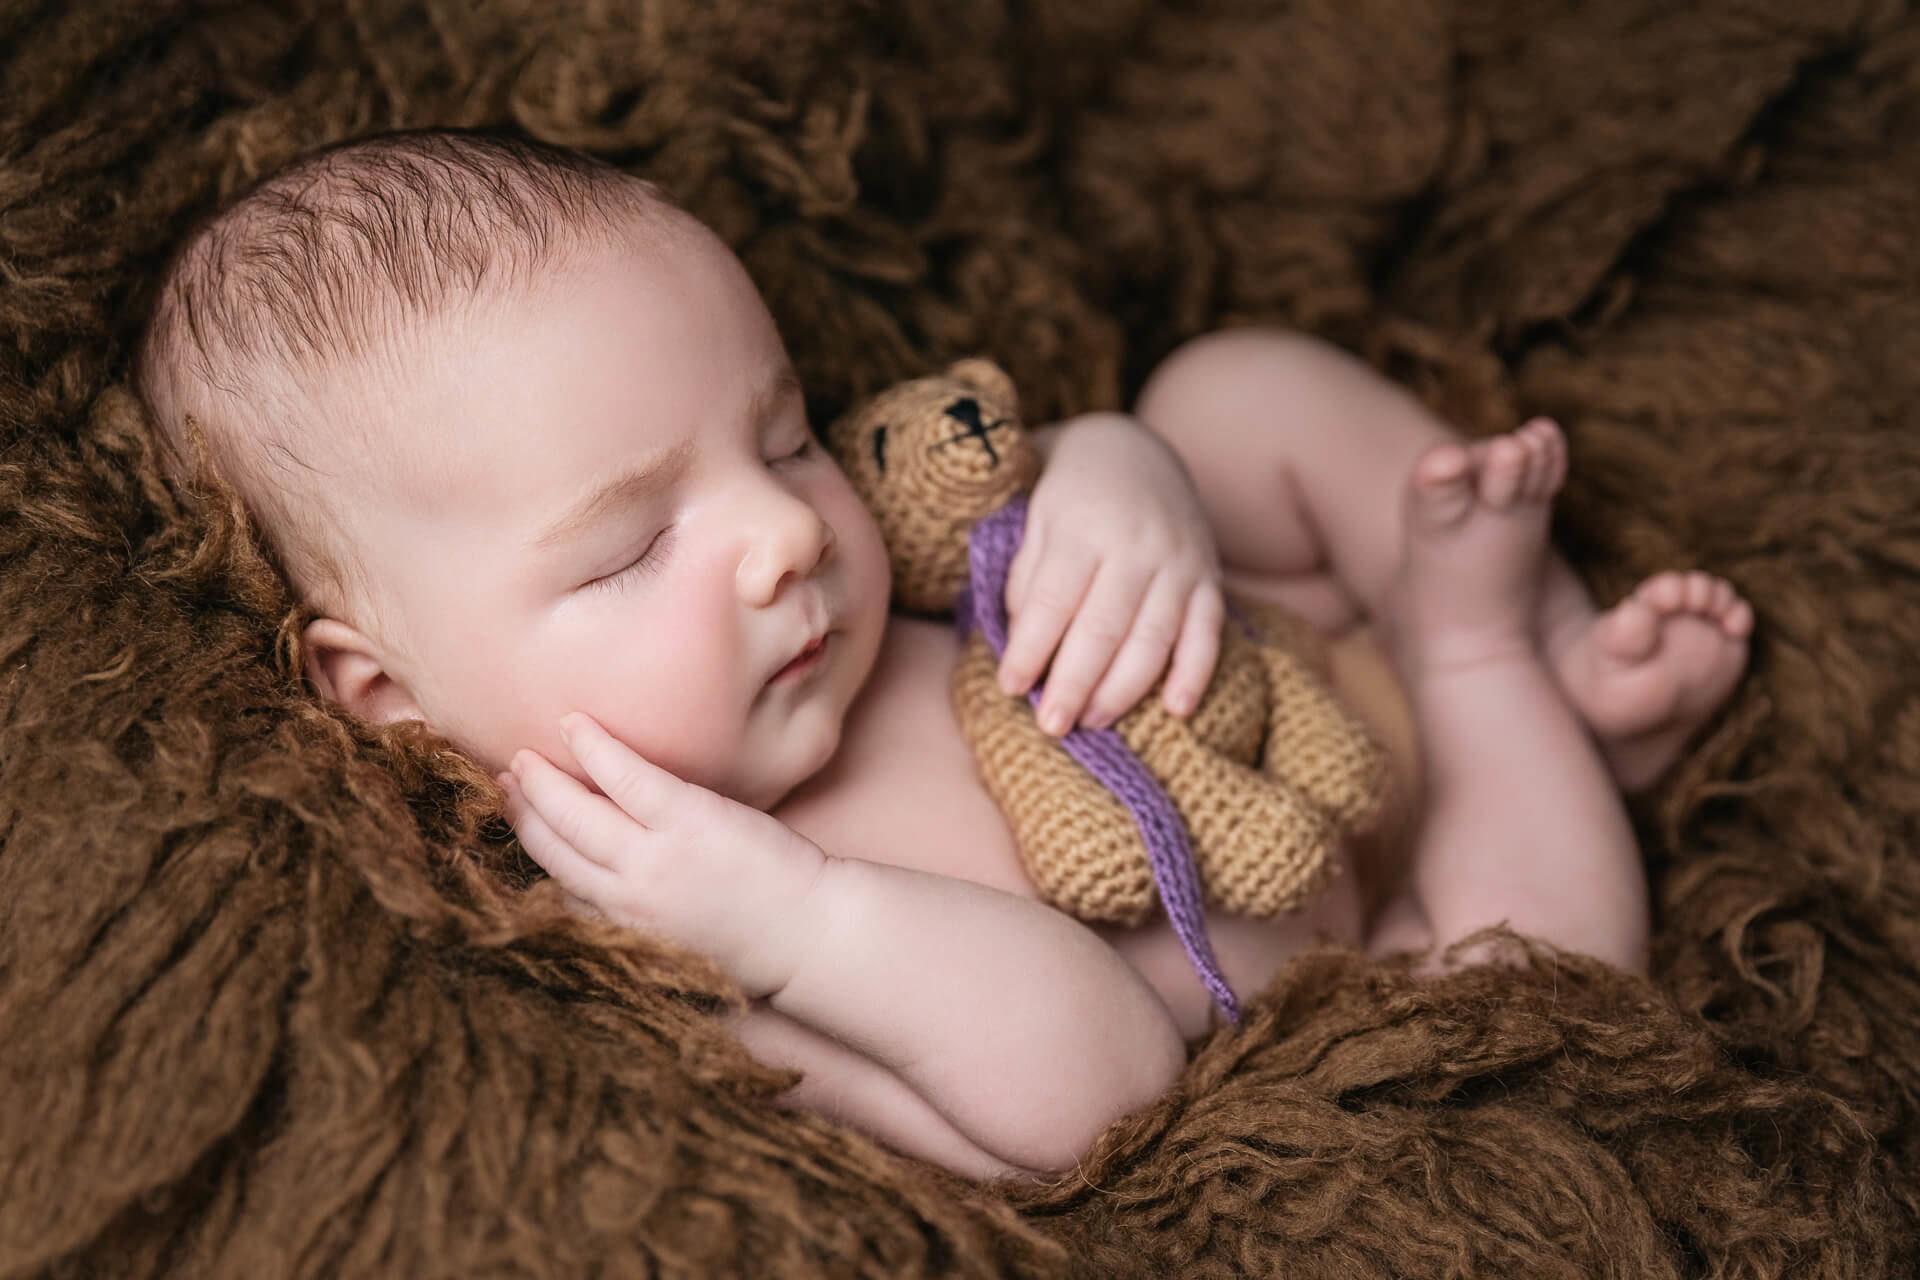 fotografia_newborn_recien_nacido_bebe_zaragoza_alejandra_lacosta_fotografa